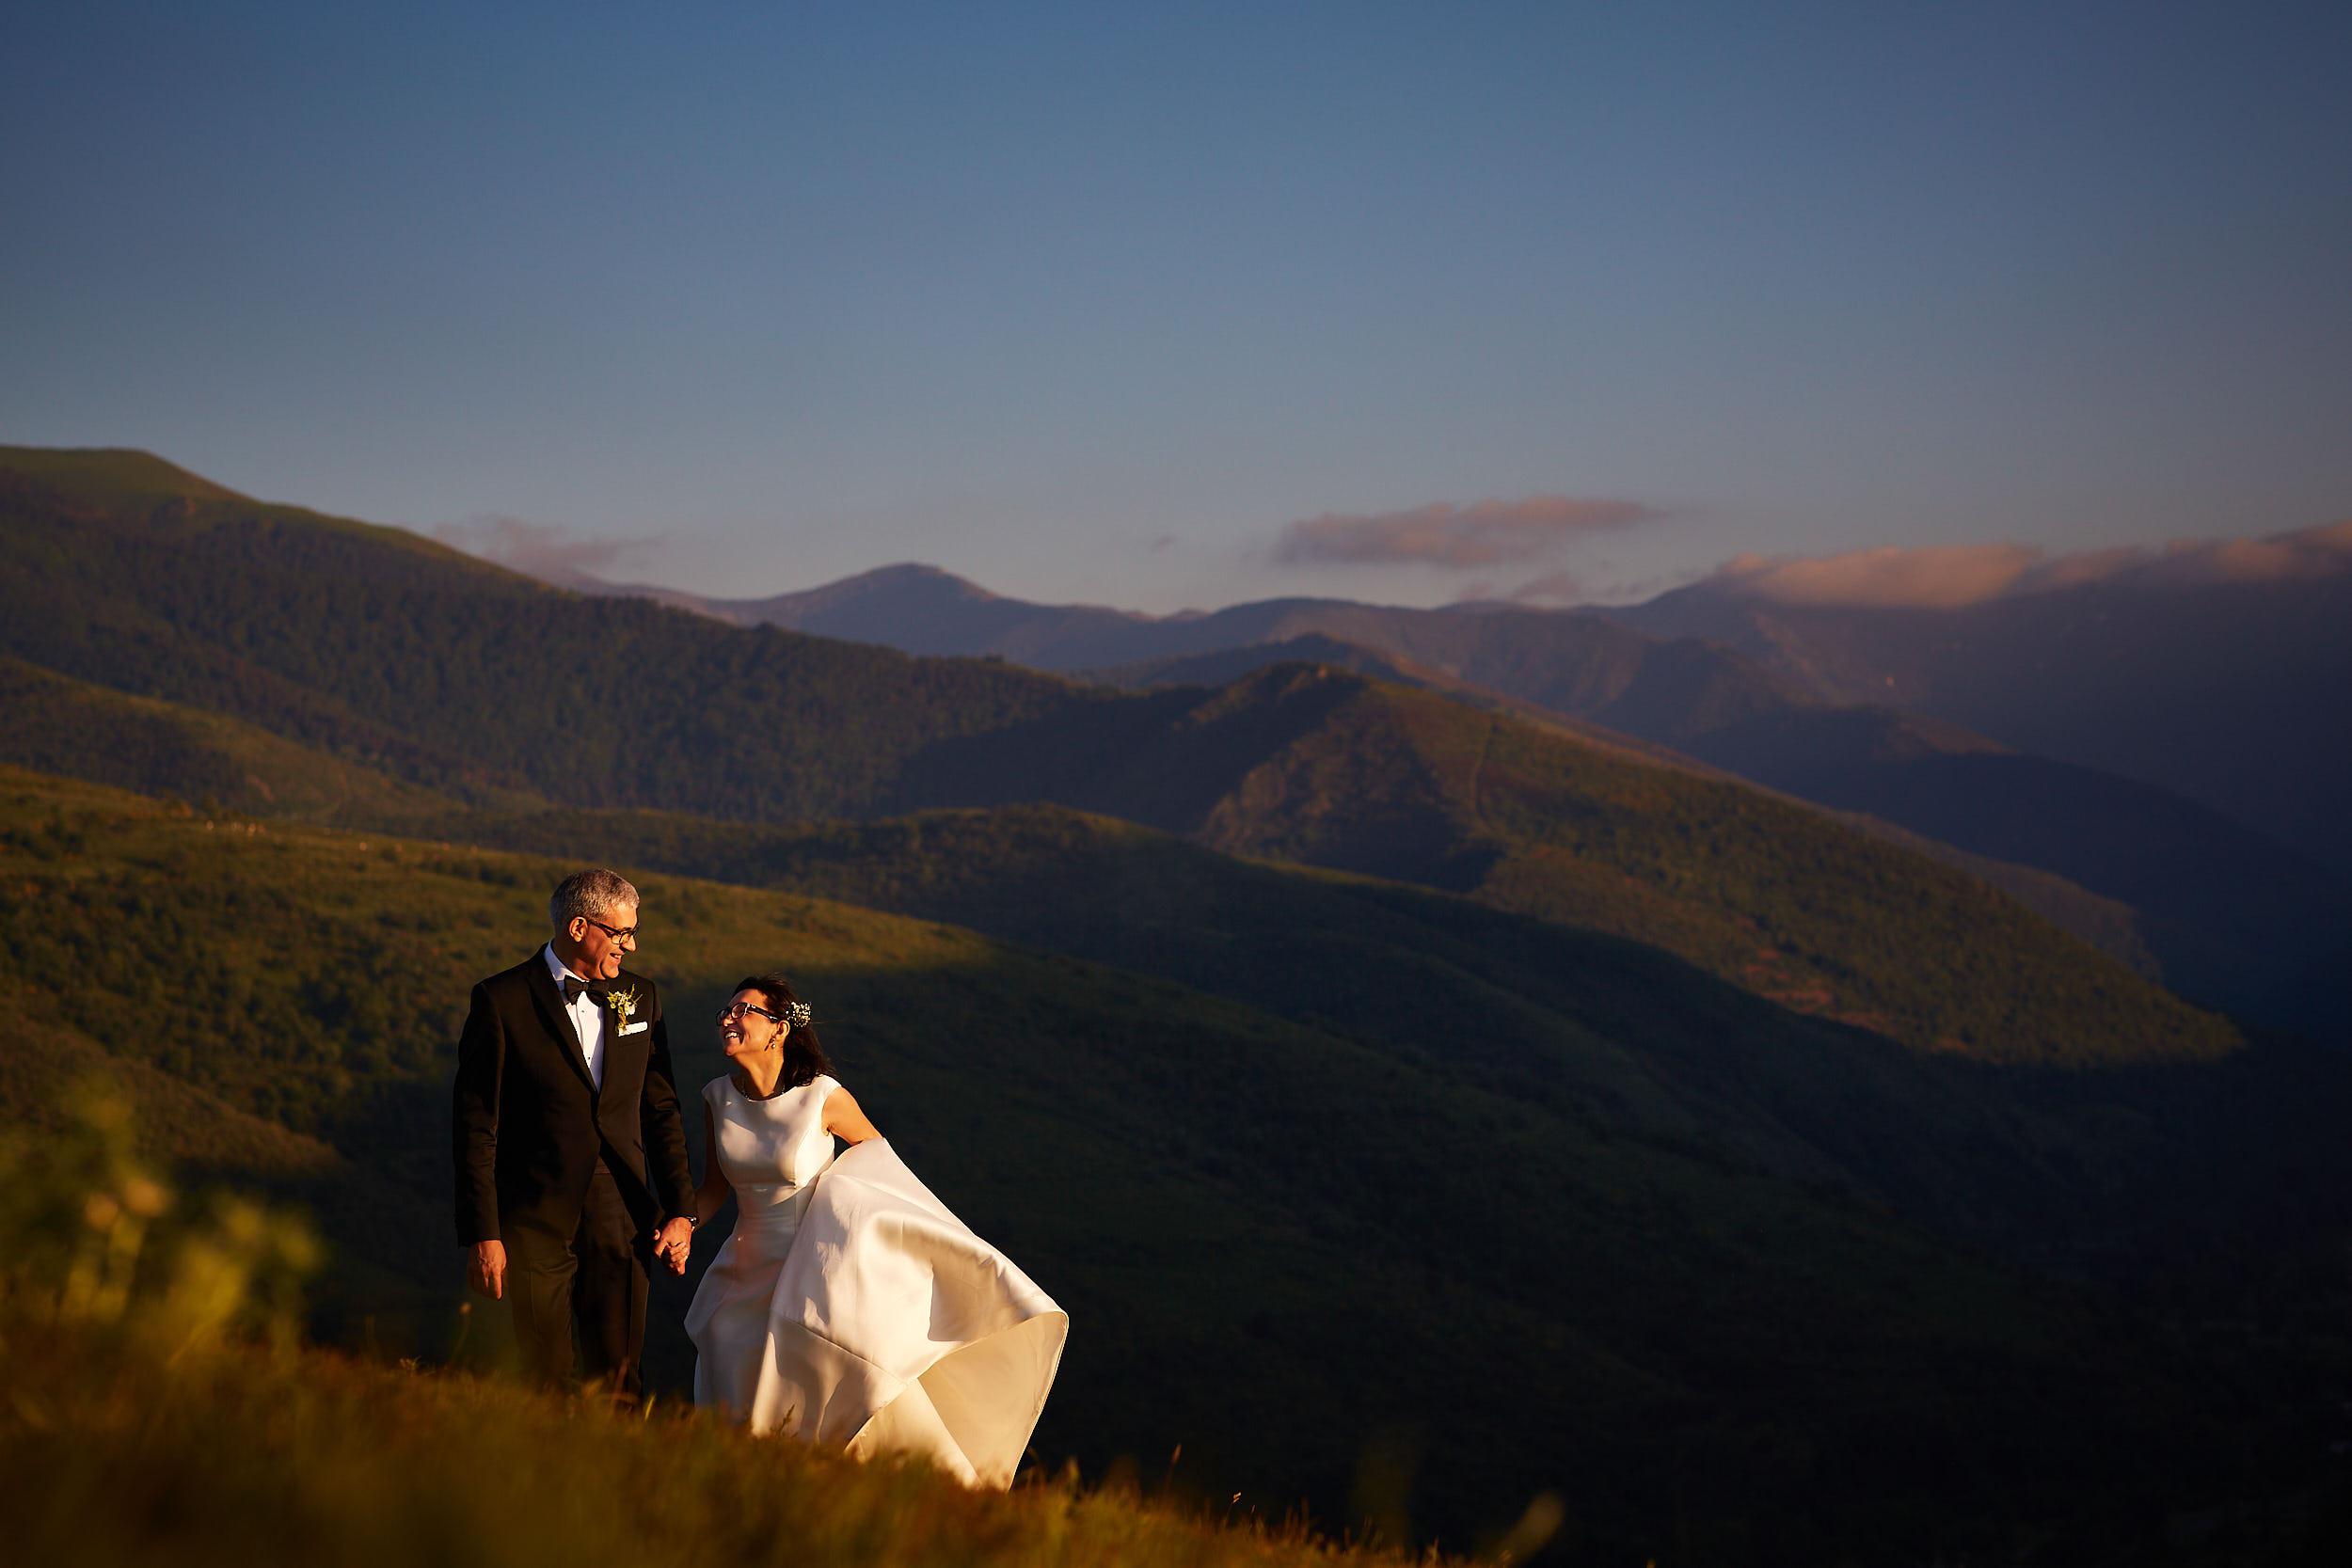 1806Basque_Country_Rioja_Wedding_Photographer_James_Sturcke_0008.jpg